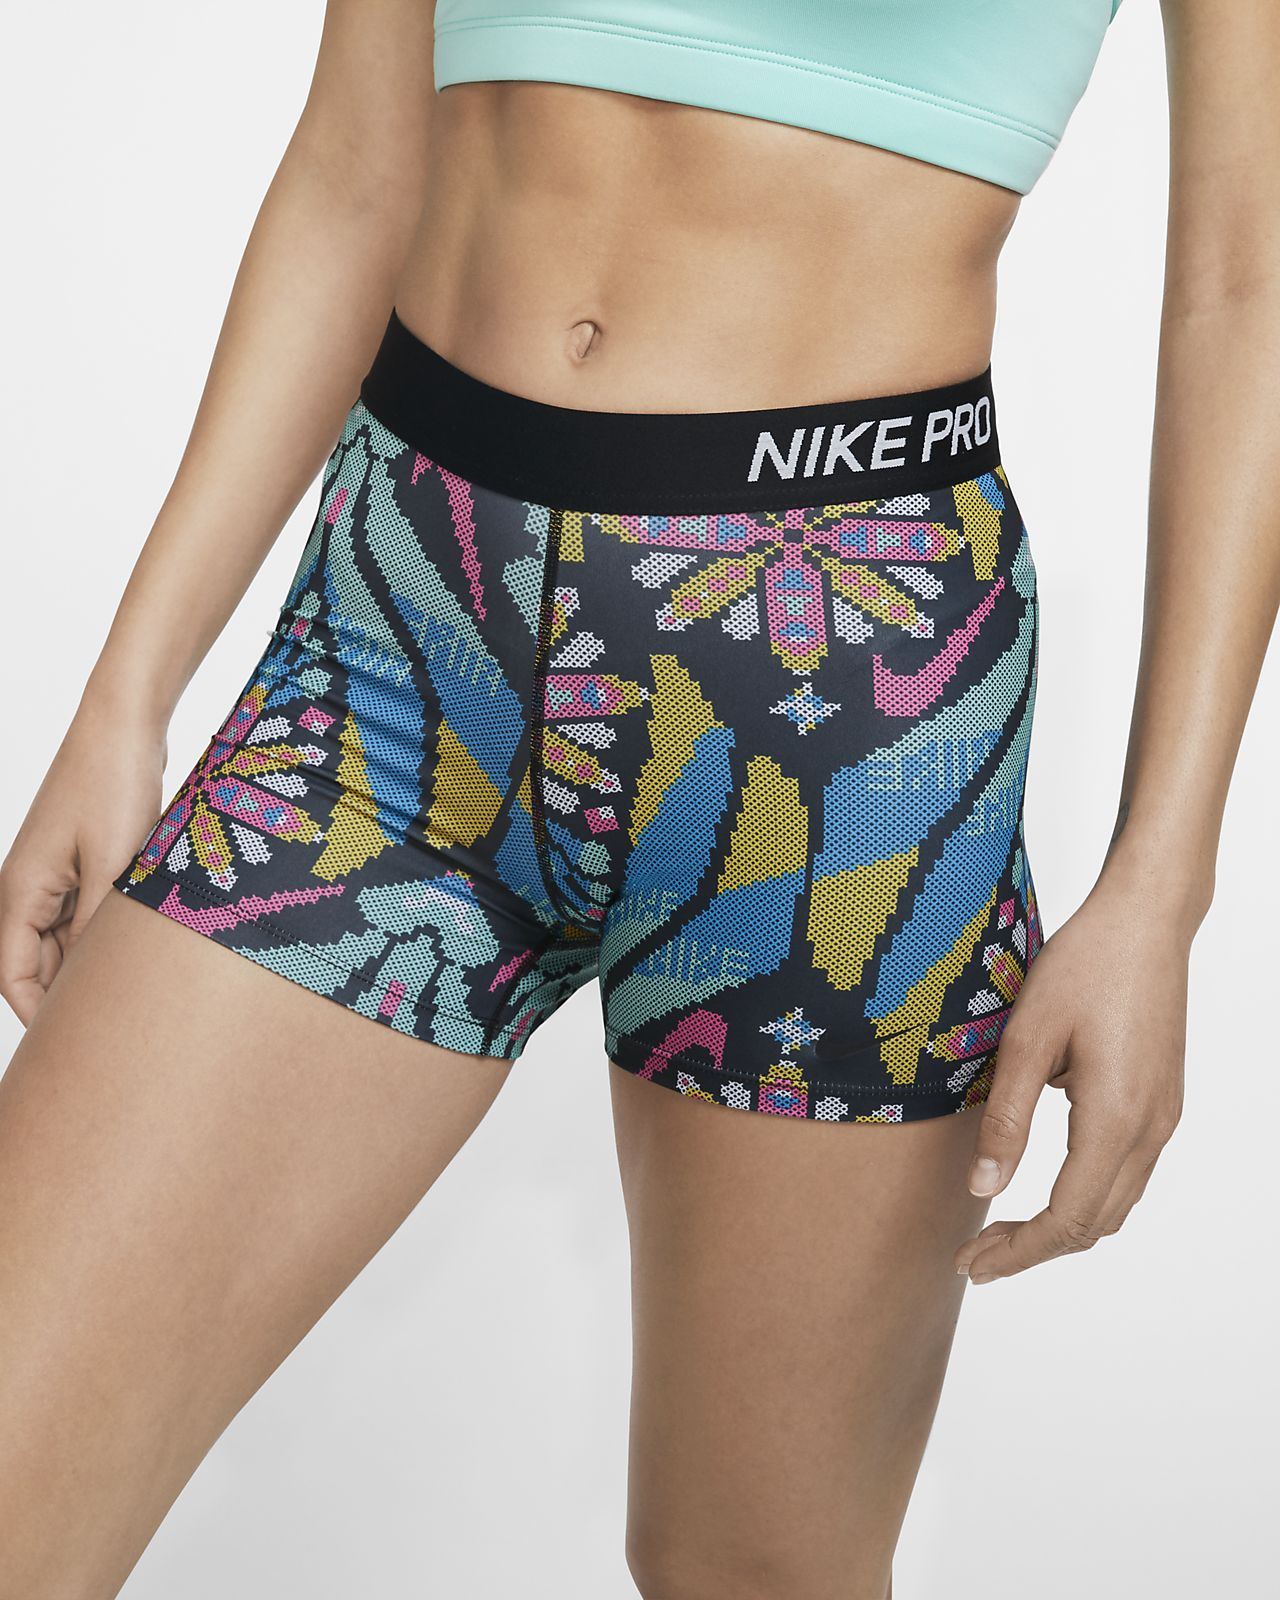 Nike Pro Pantalons curts estampats de 8 cm - Dona